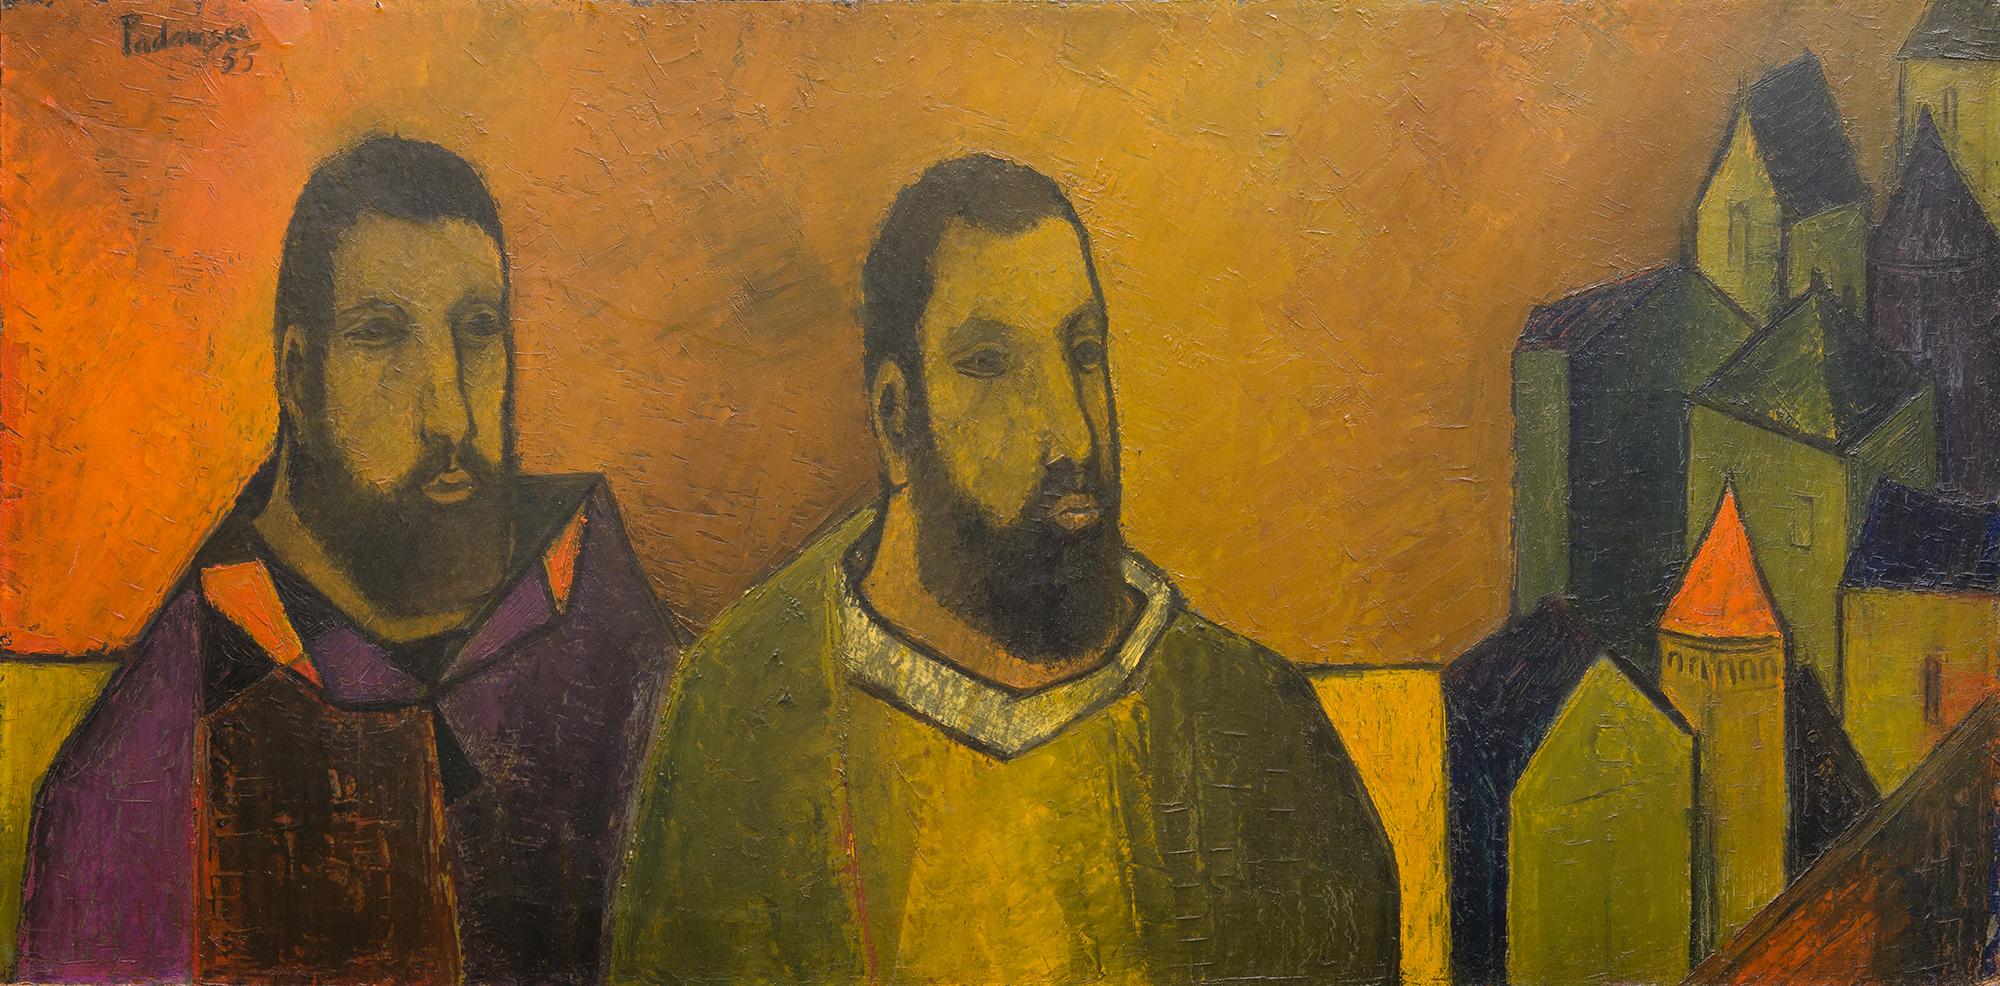 Untitled (Disciples in Landscape), Akbar Padamsee